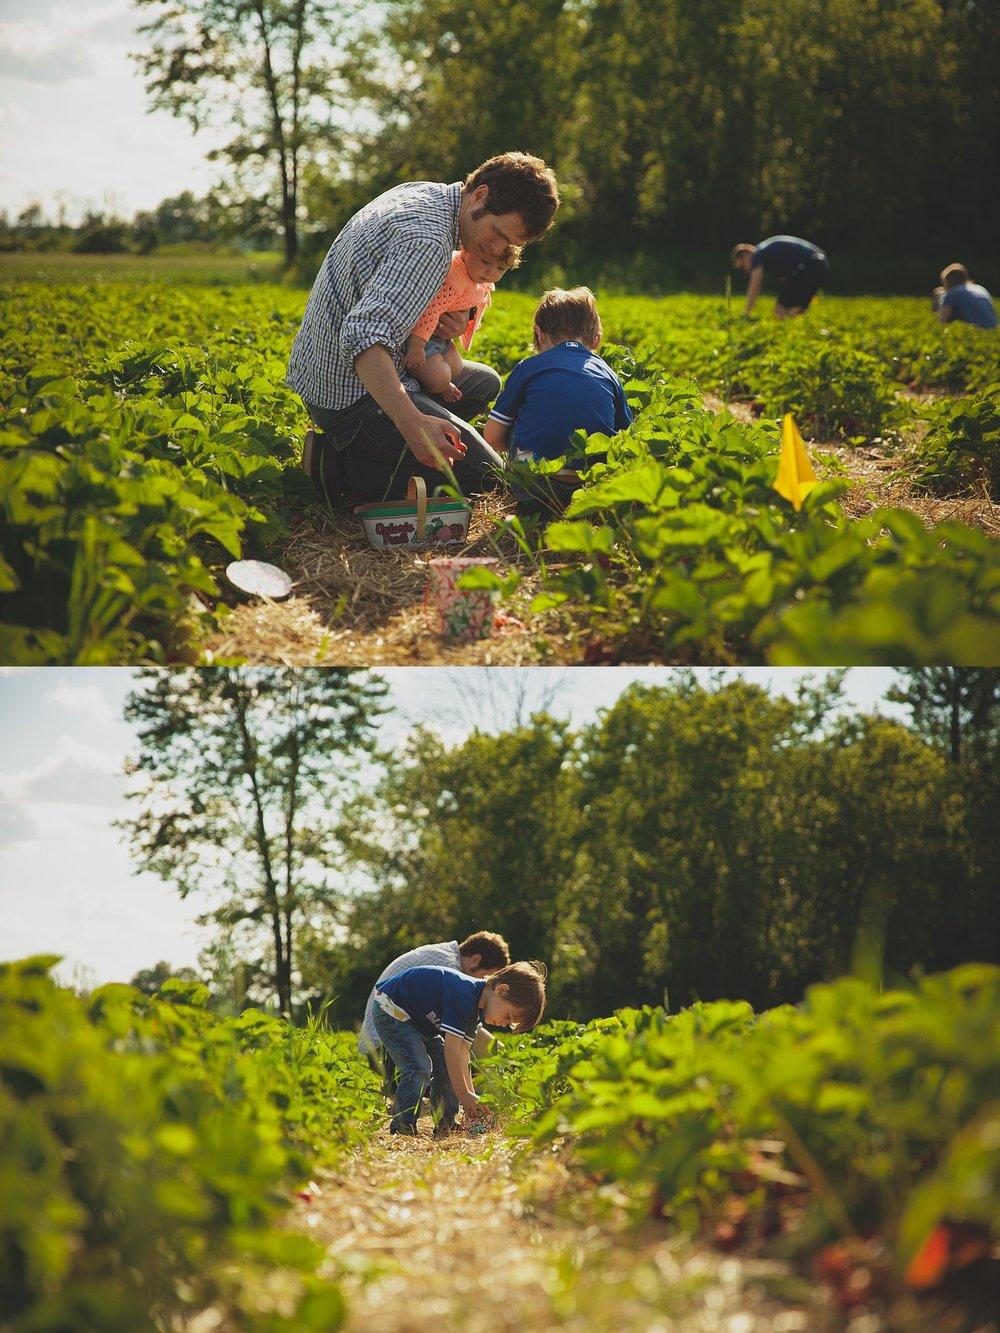 Photograph of family harvesting fresh strawberries.